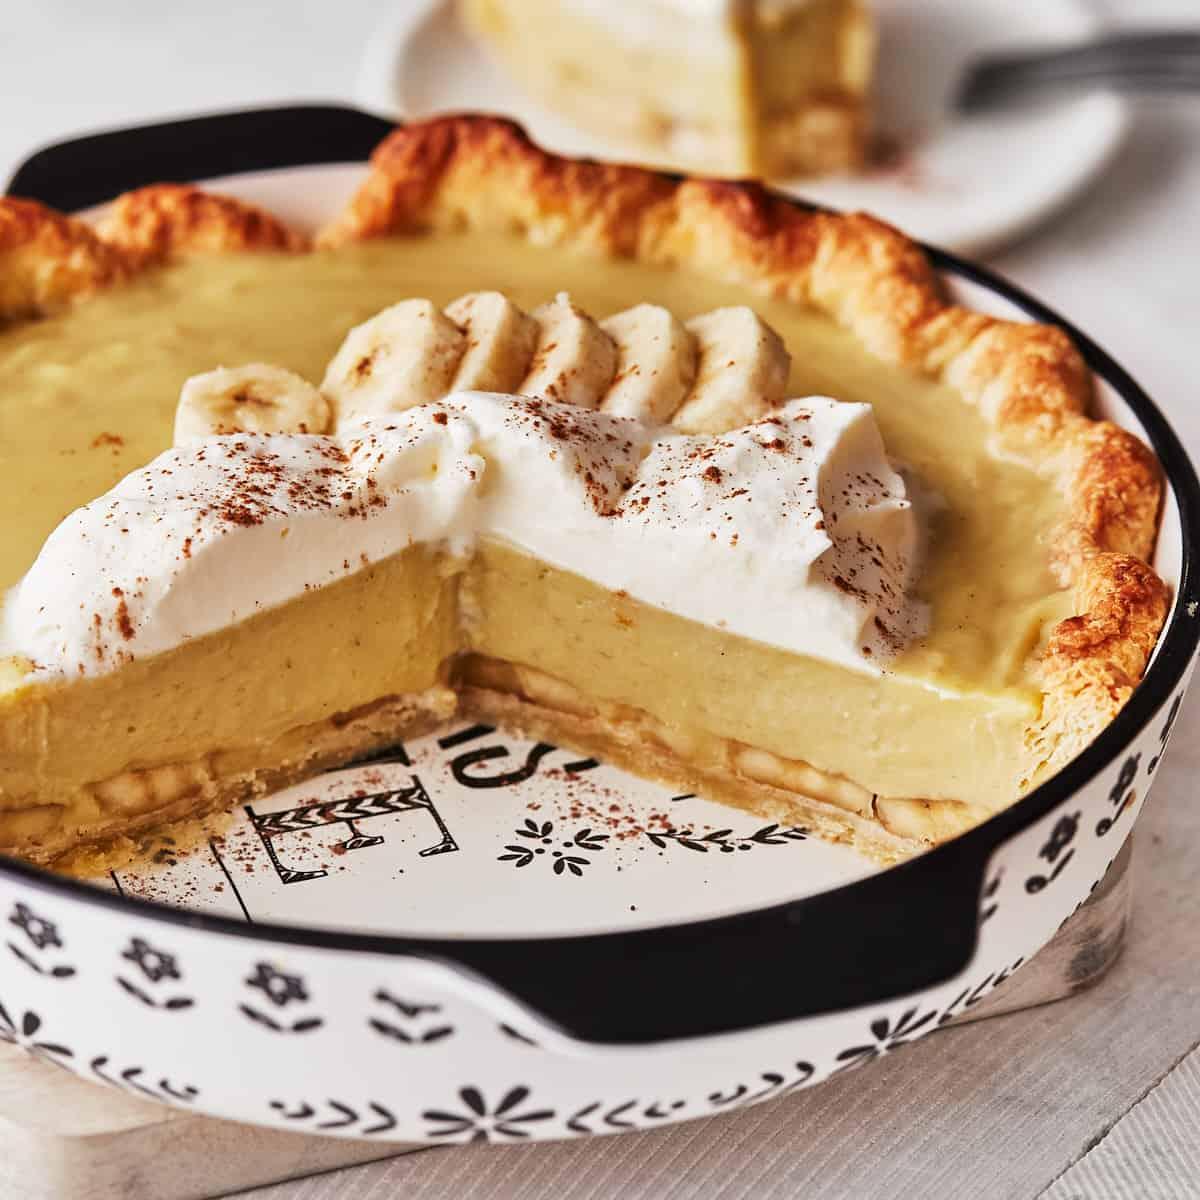 Decorative picture of cut pie in pie dish